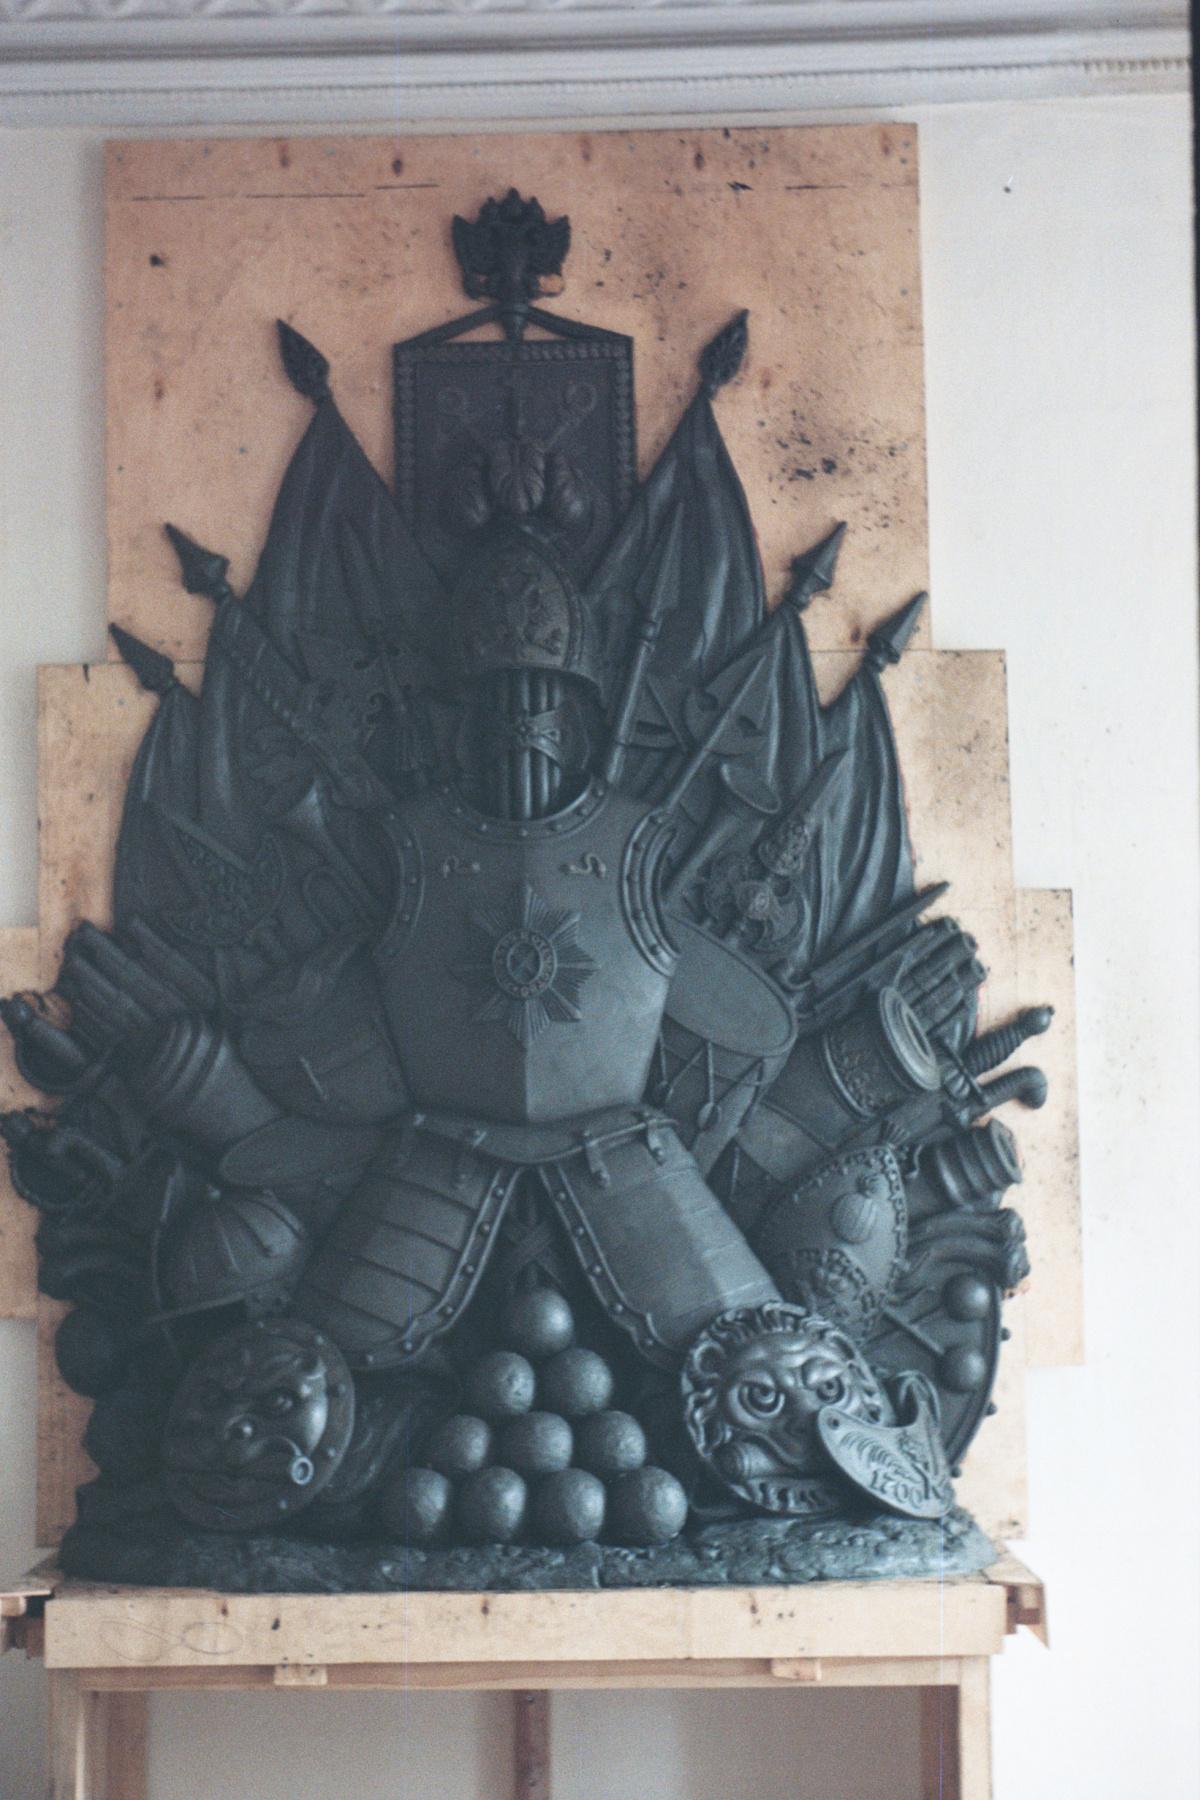 Александр Сергеевич Кривонос. Sculpture. Kremlin. Advance hall.